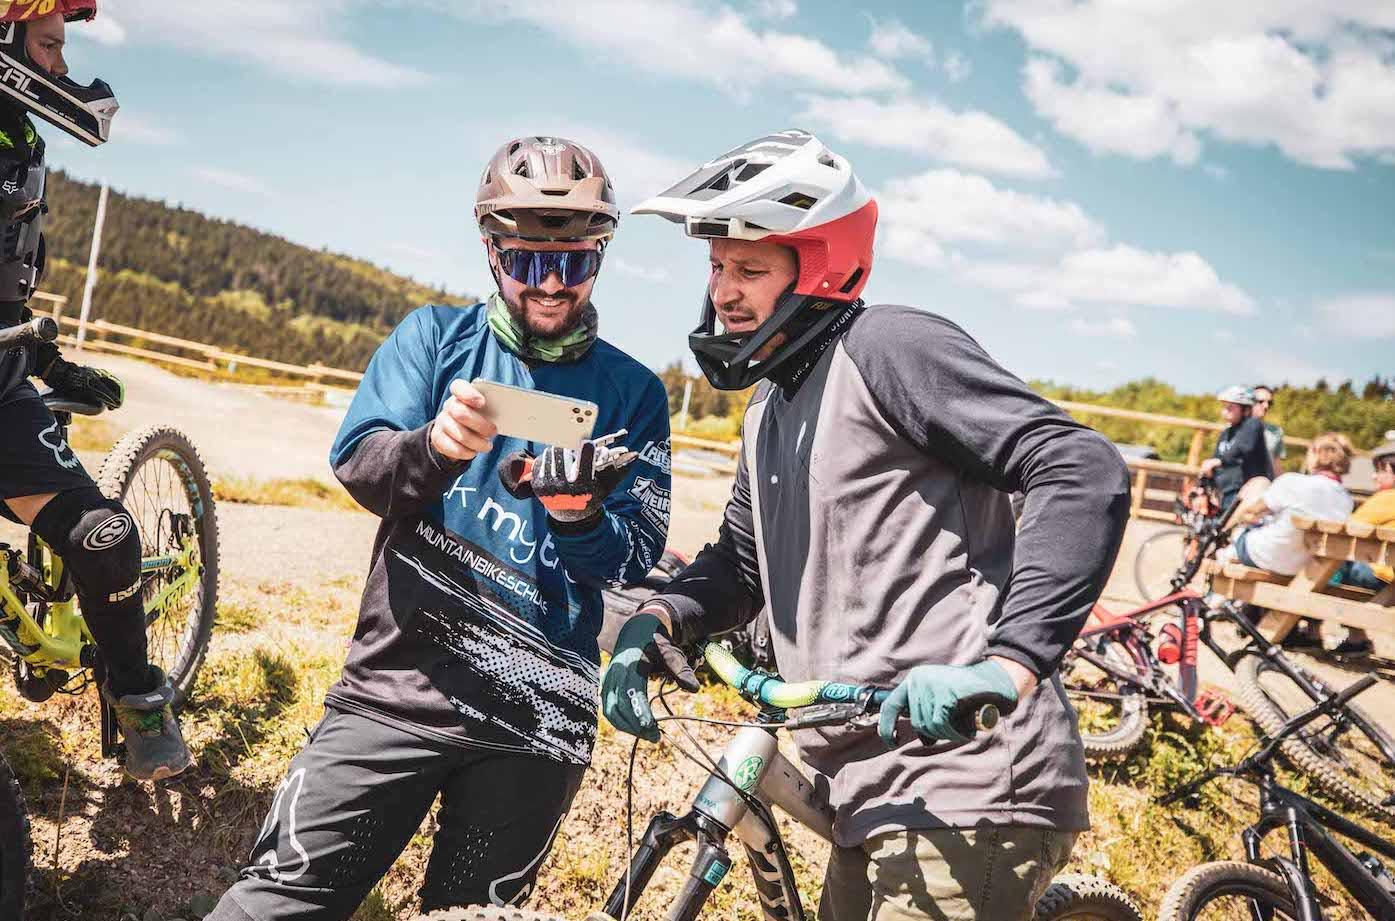 Bikepark Starter Kurs Geißkopf - Fahrtechnik - Rock my Trail